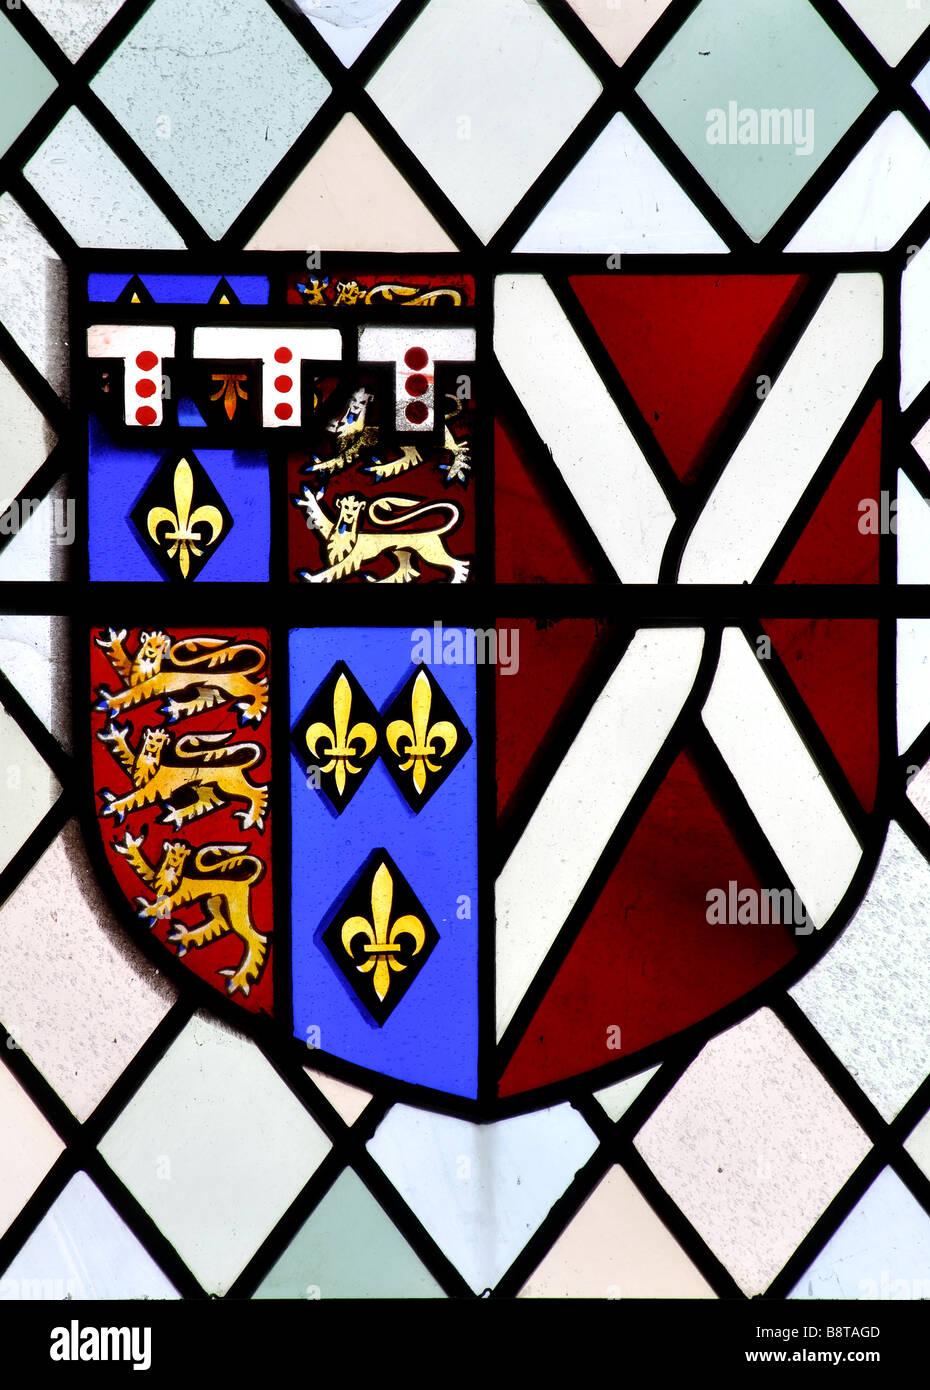 Arms of Richard, 3rd Duke of York, 1411-1460 - Stock Image